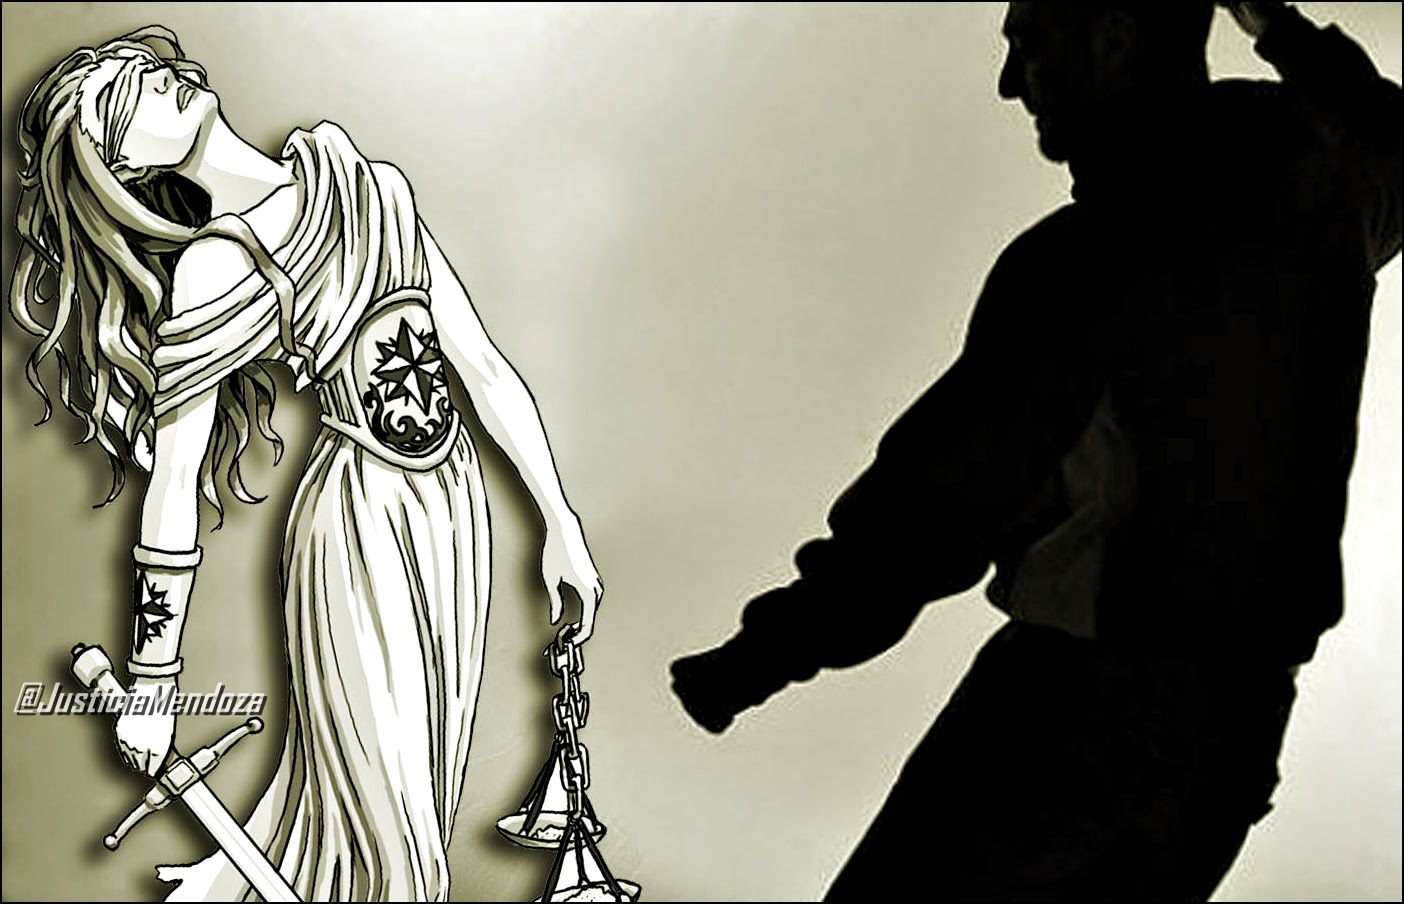 Justicia machista